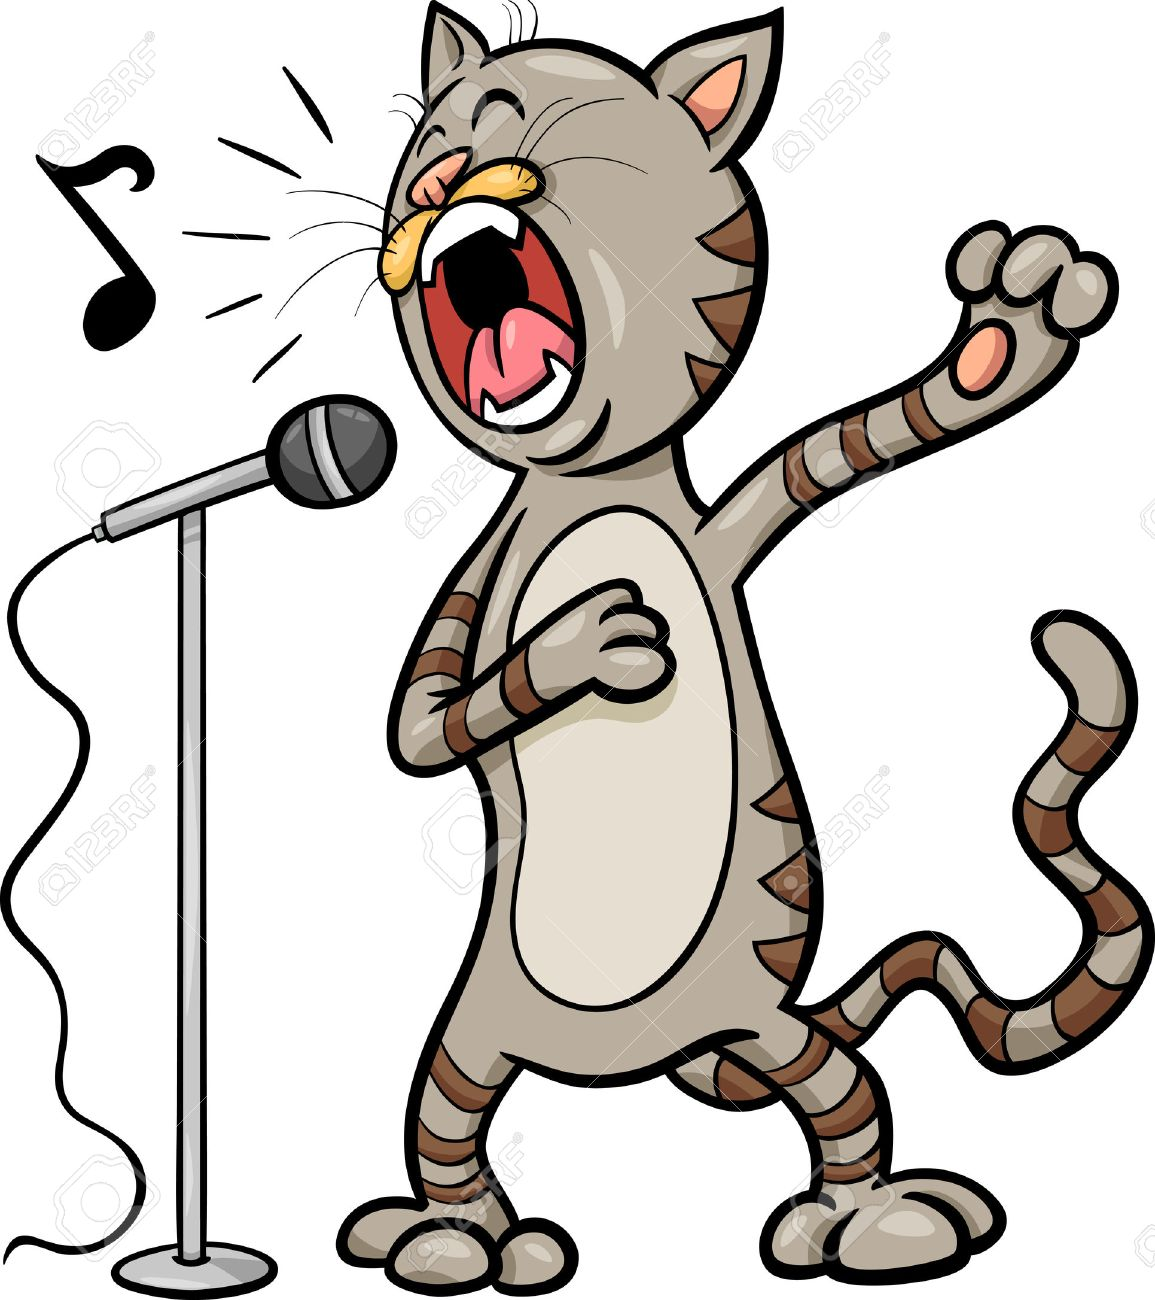 cartoon illustration of funny singing cat character royalty free rh 123rf com funny black cat clipart funny kitty clipart